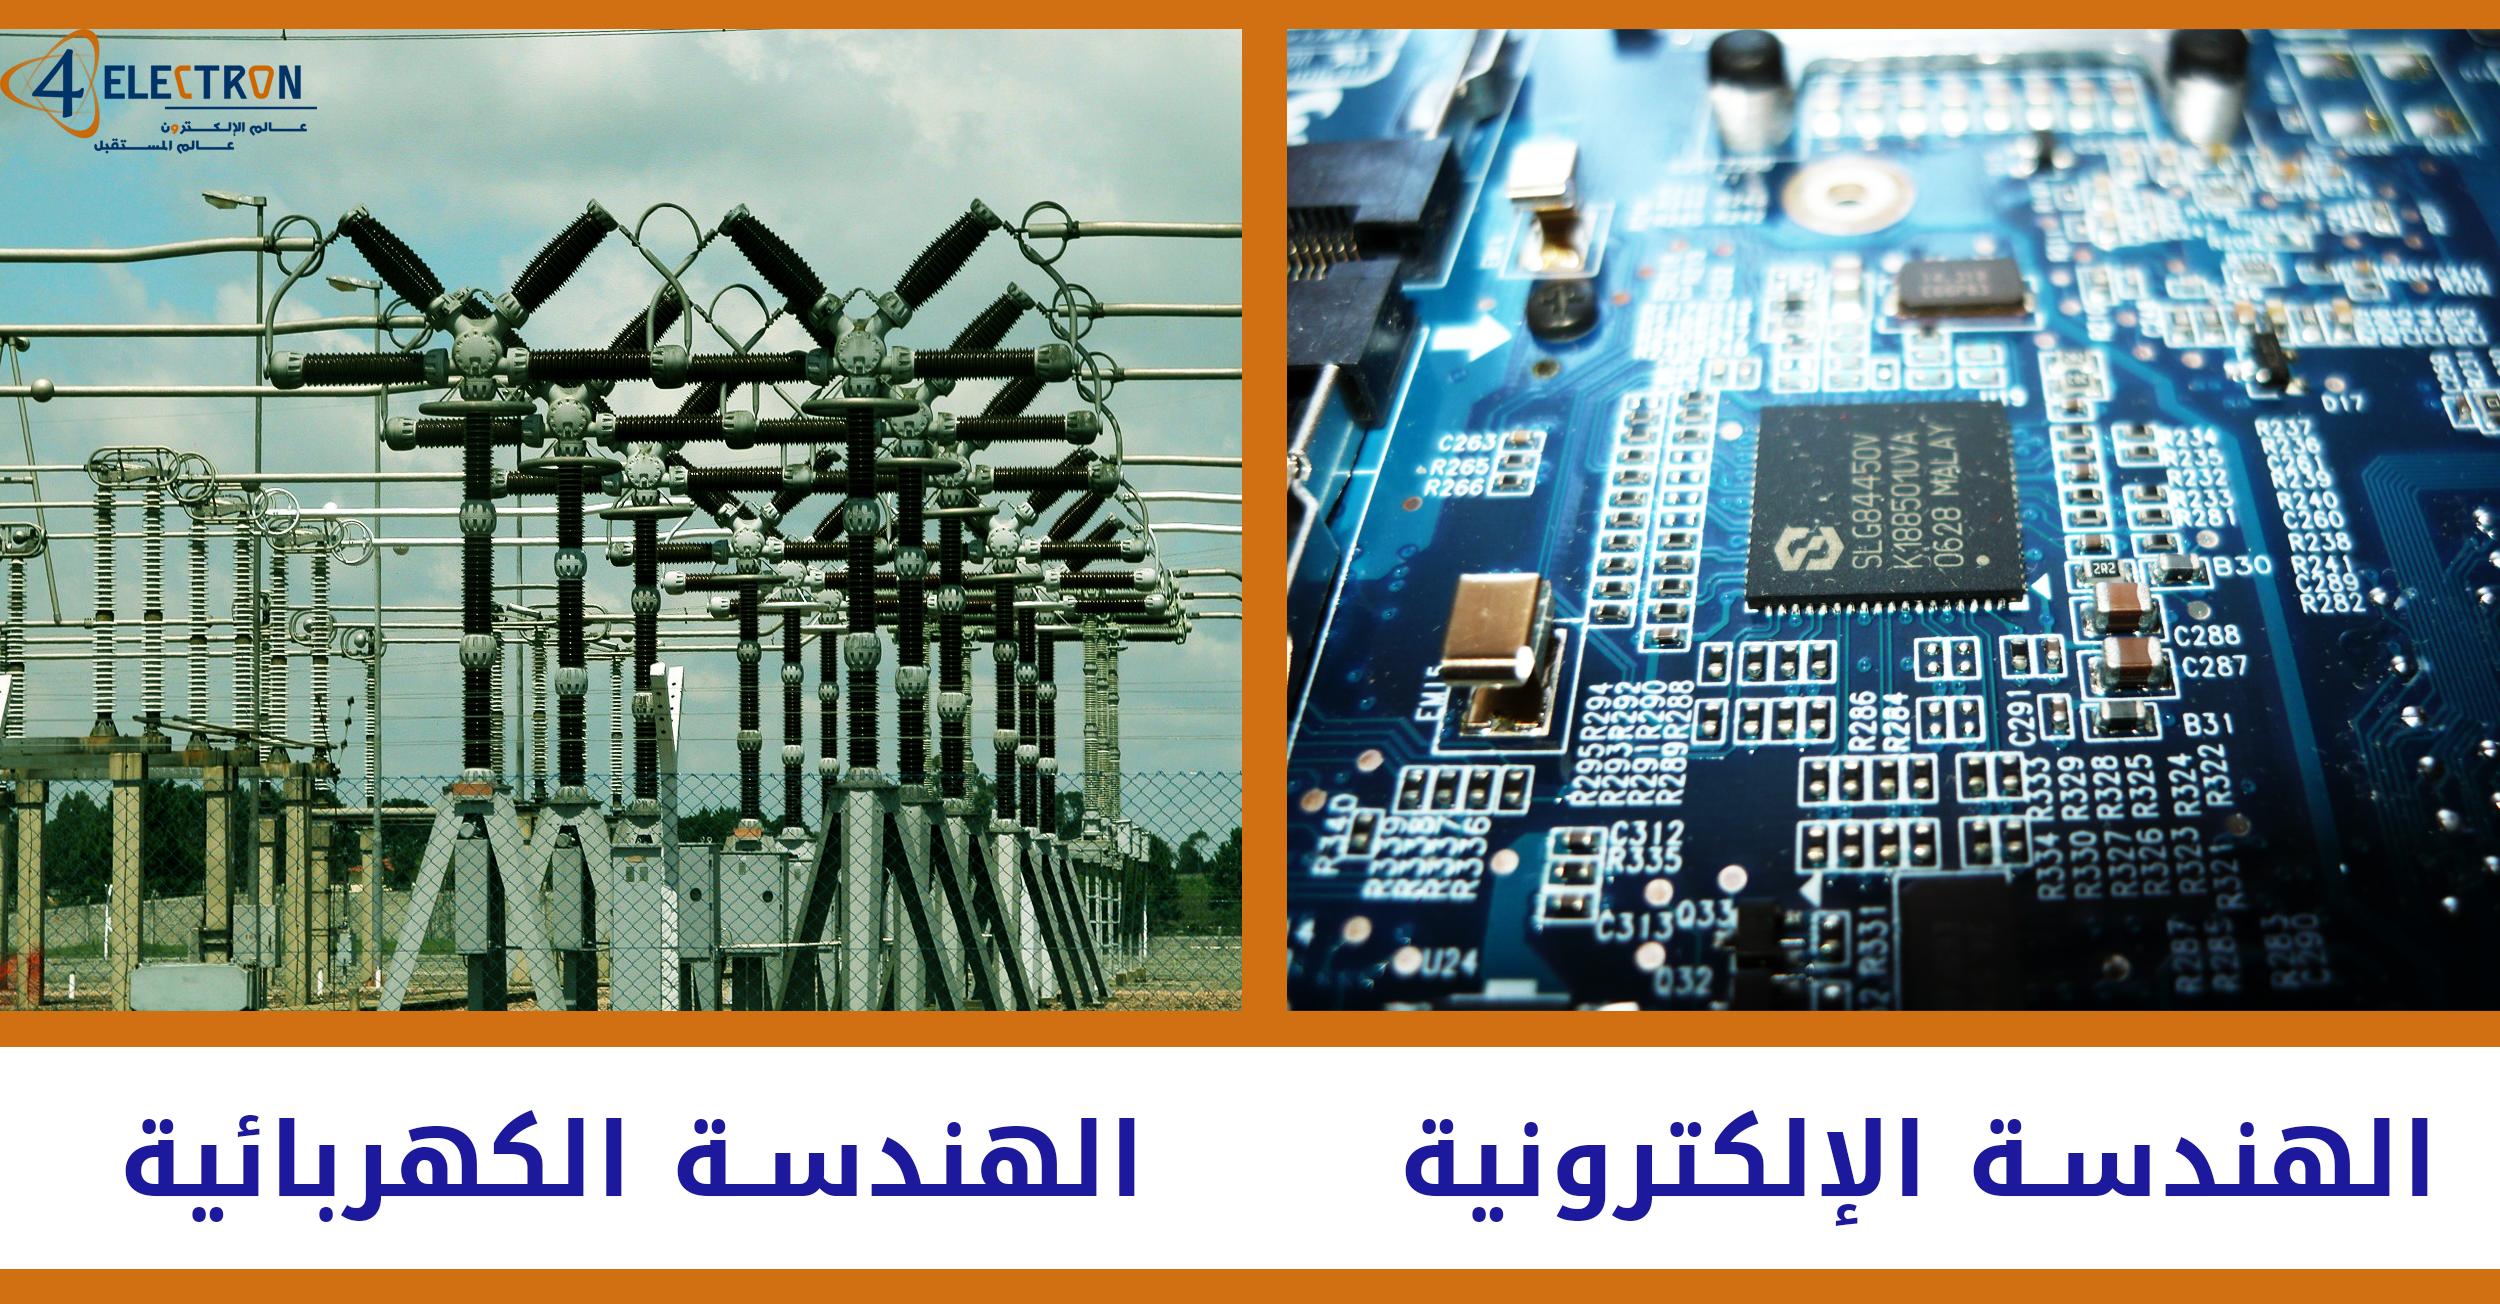 4electron-electrical-electronics